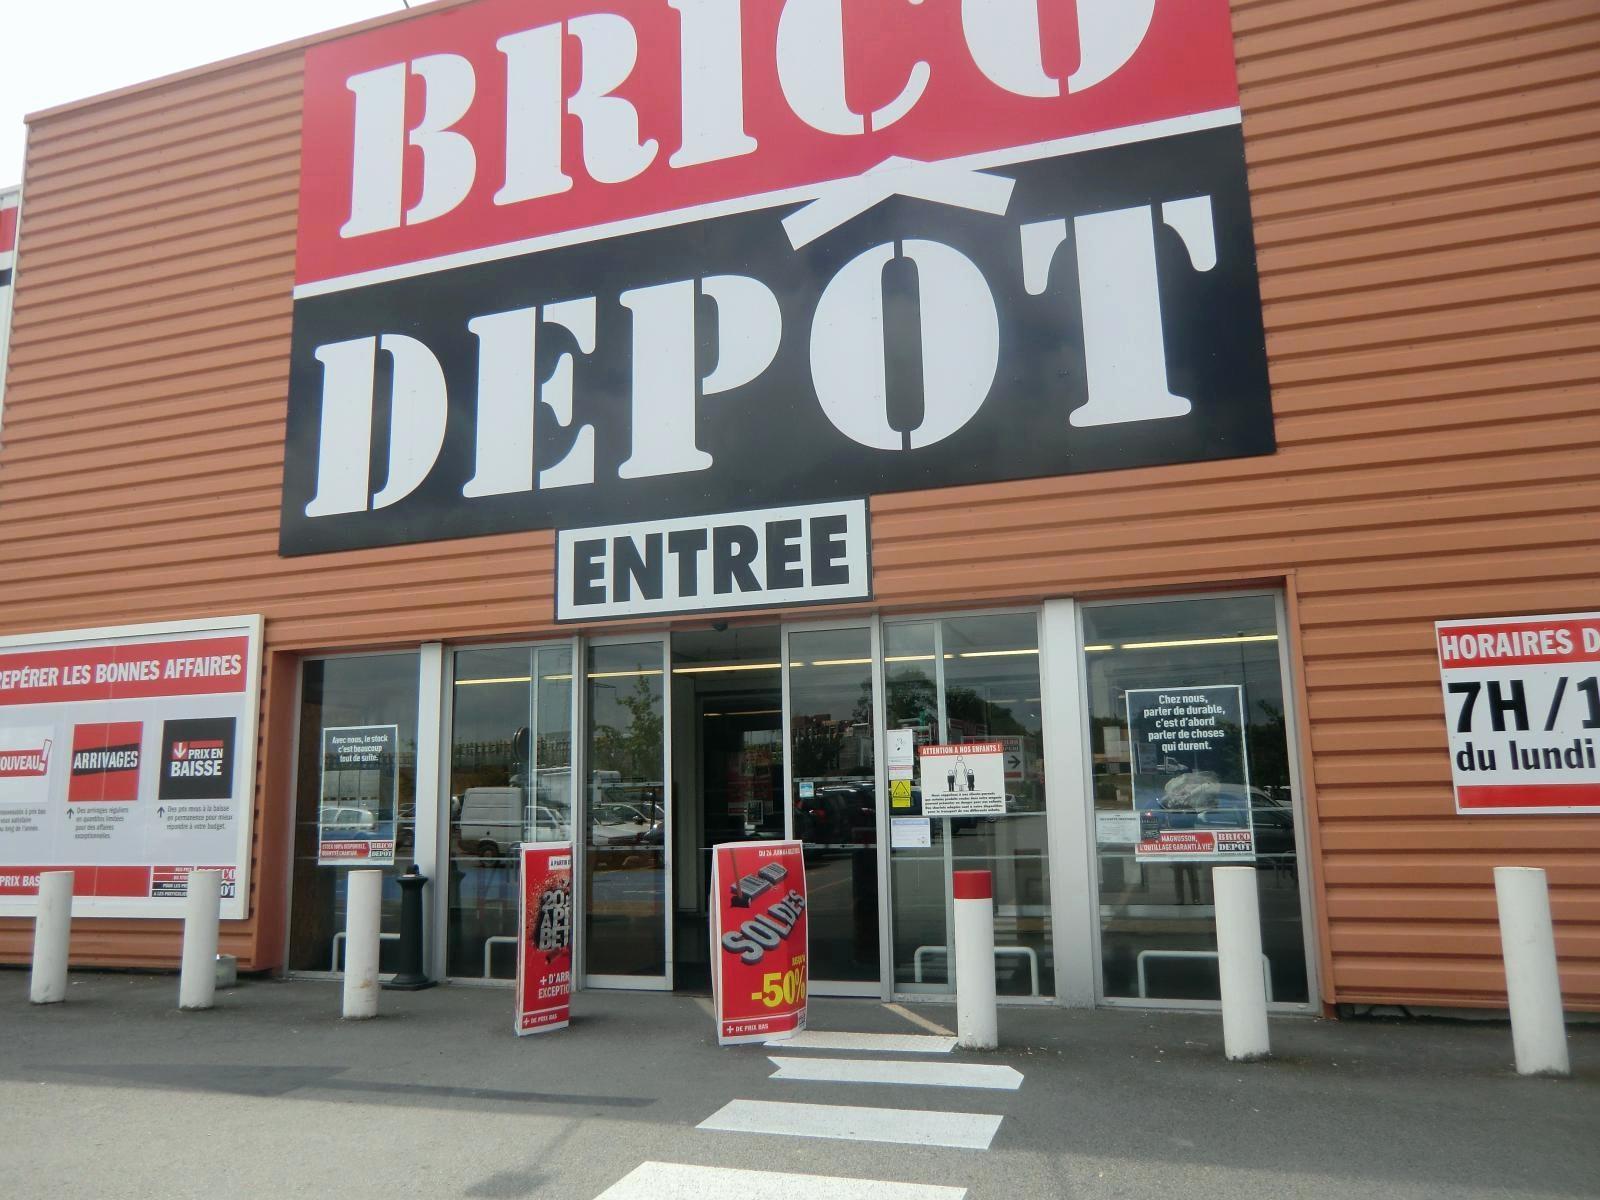 Brico Depot Cabane De Jardin Meilleur De Images Brico Depot Abri Jardin Beau Abris De Jardin Brico Depot Cloture